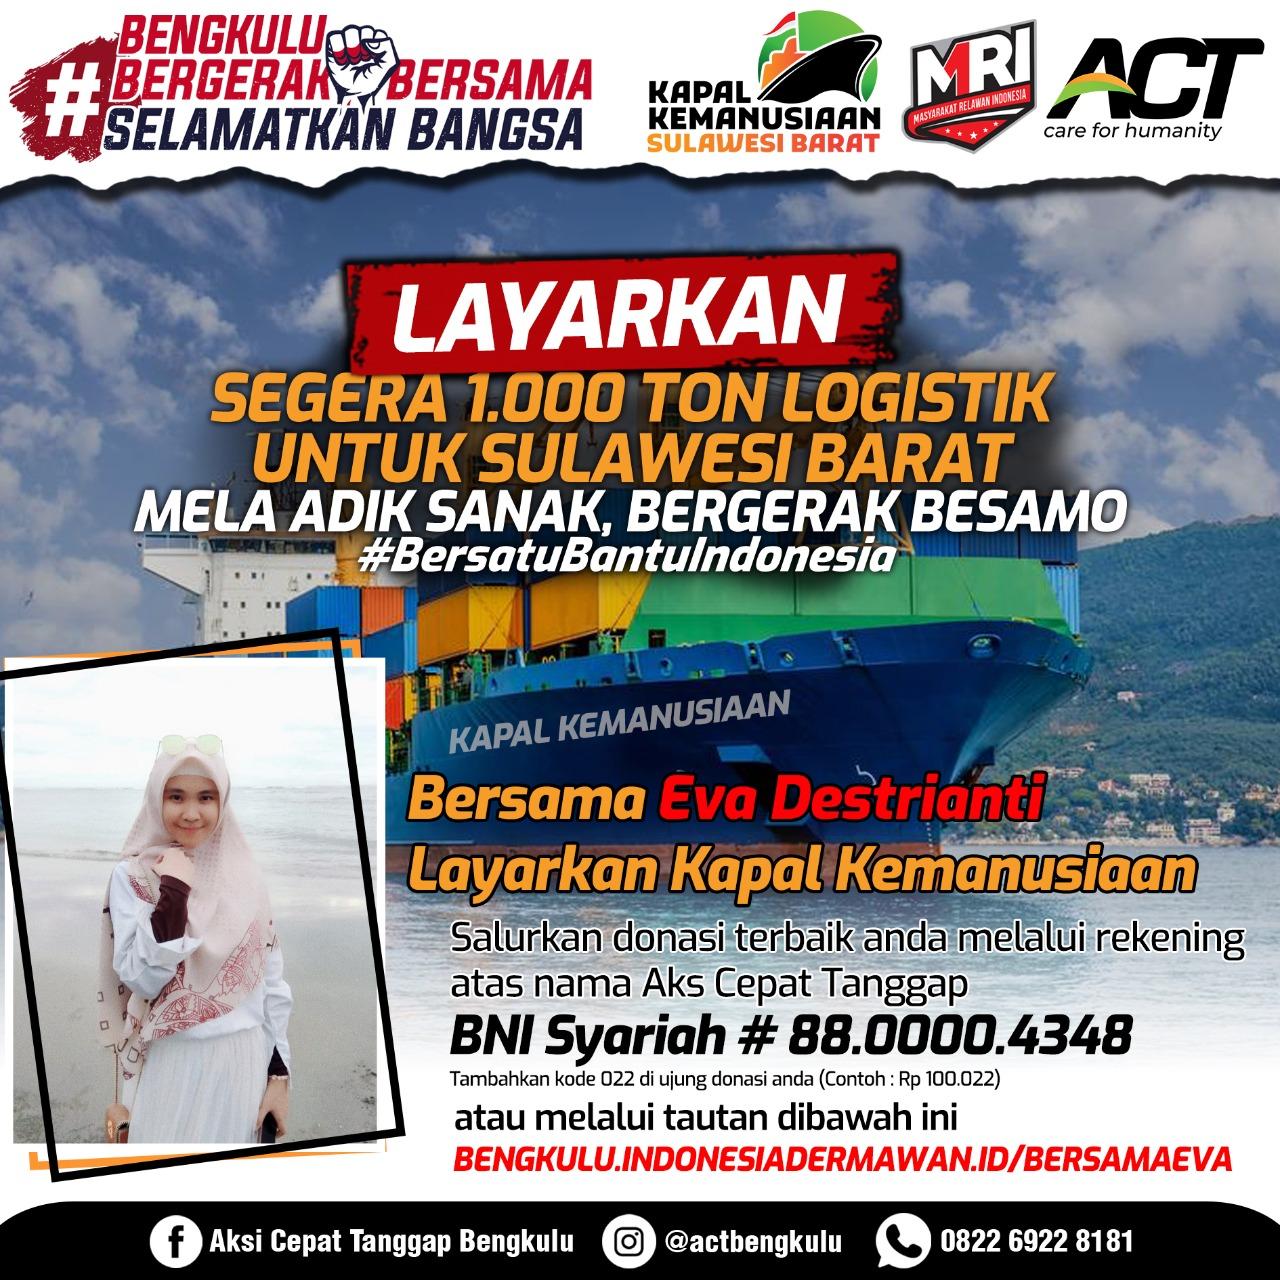 ACT-MRI Bengkulu: Kapal Kemanusiaan Siap Berlayar Menuju Sulawesi Barat